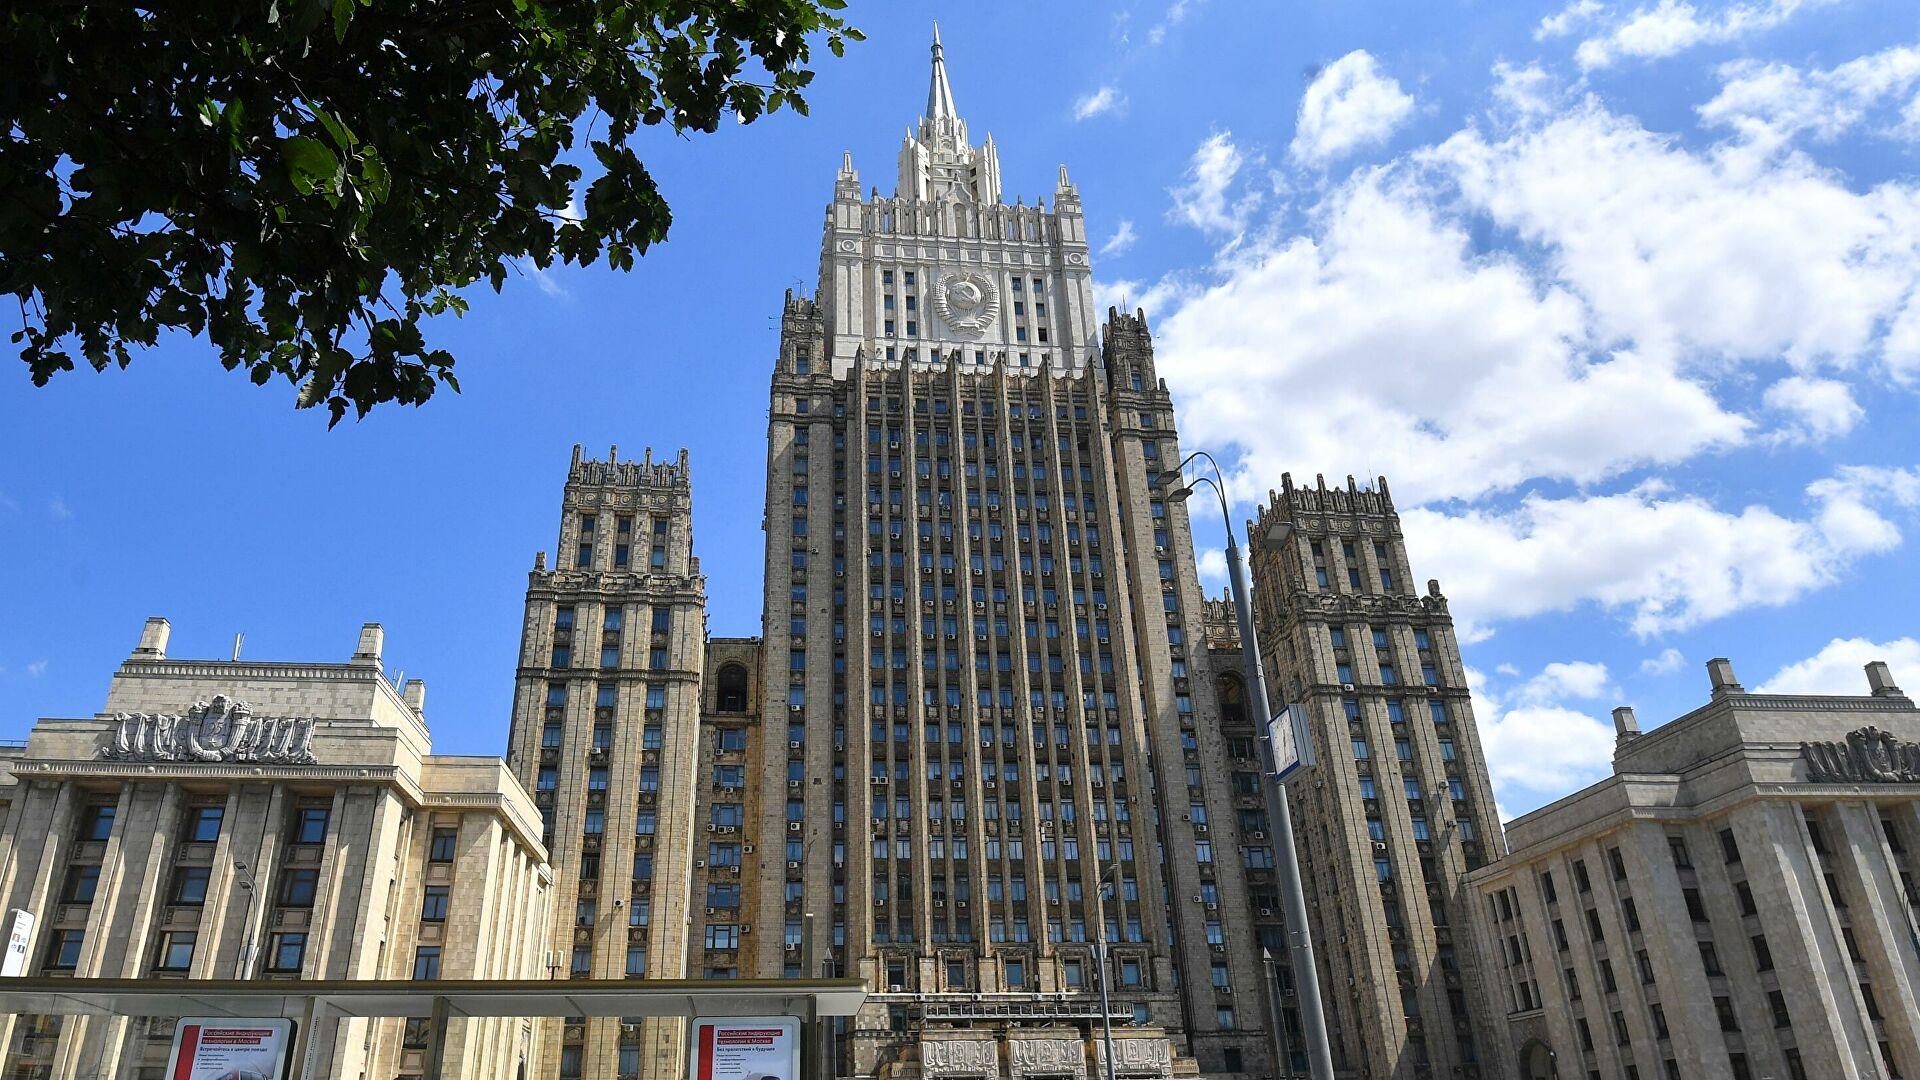 Rusija spremna da razgovara o ideji stvaranja multilateralnih pregovaračkih formata radi sprečavanja trke u naoružanju